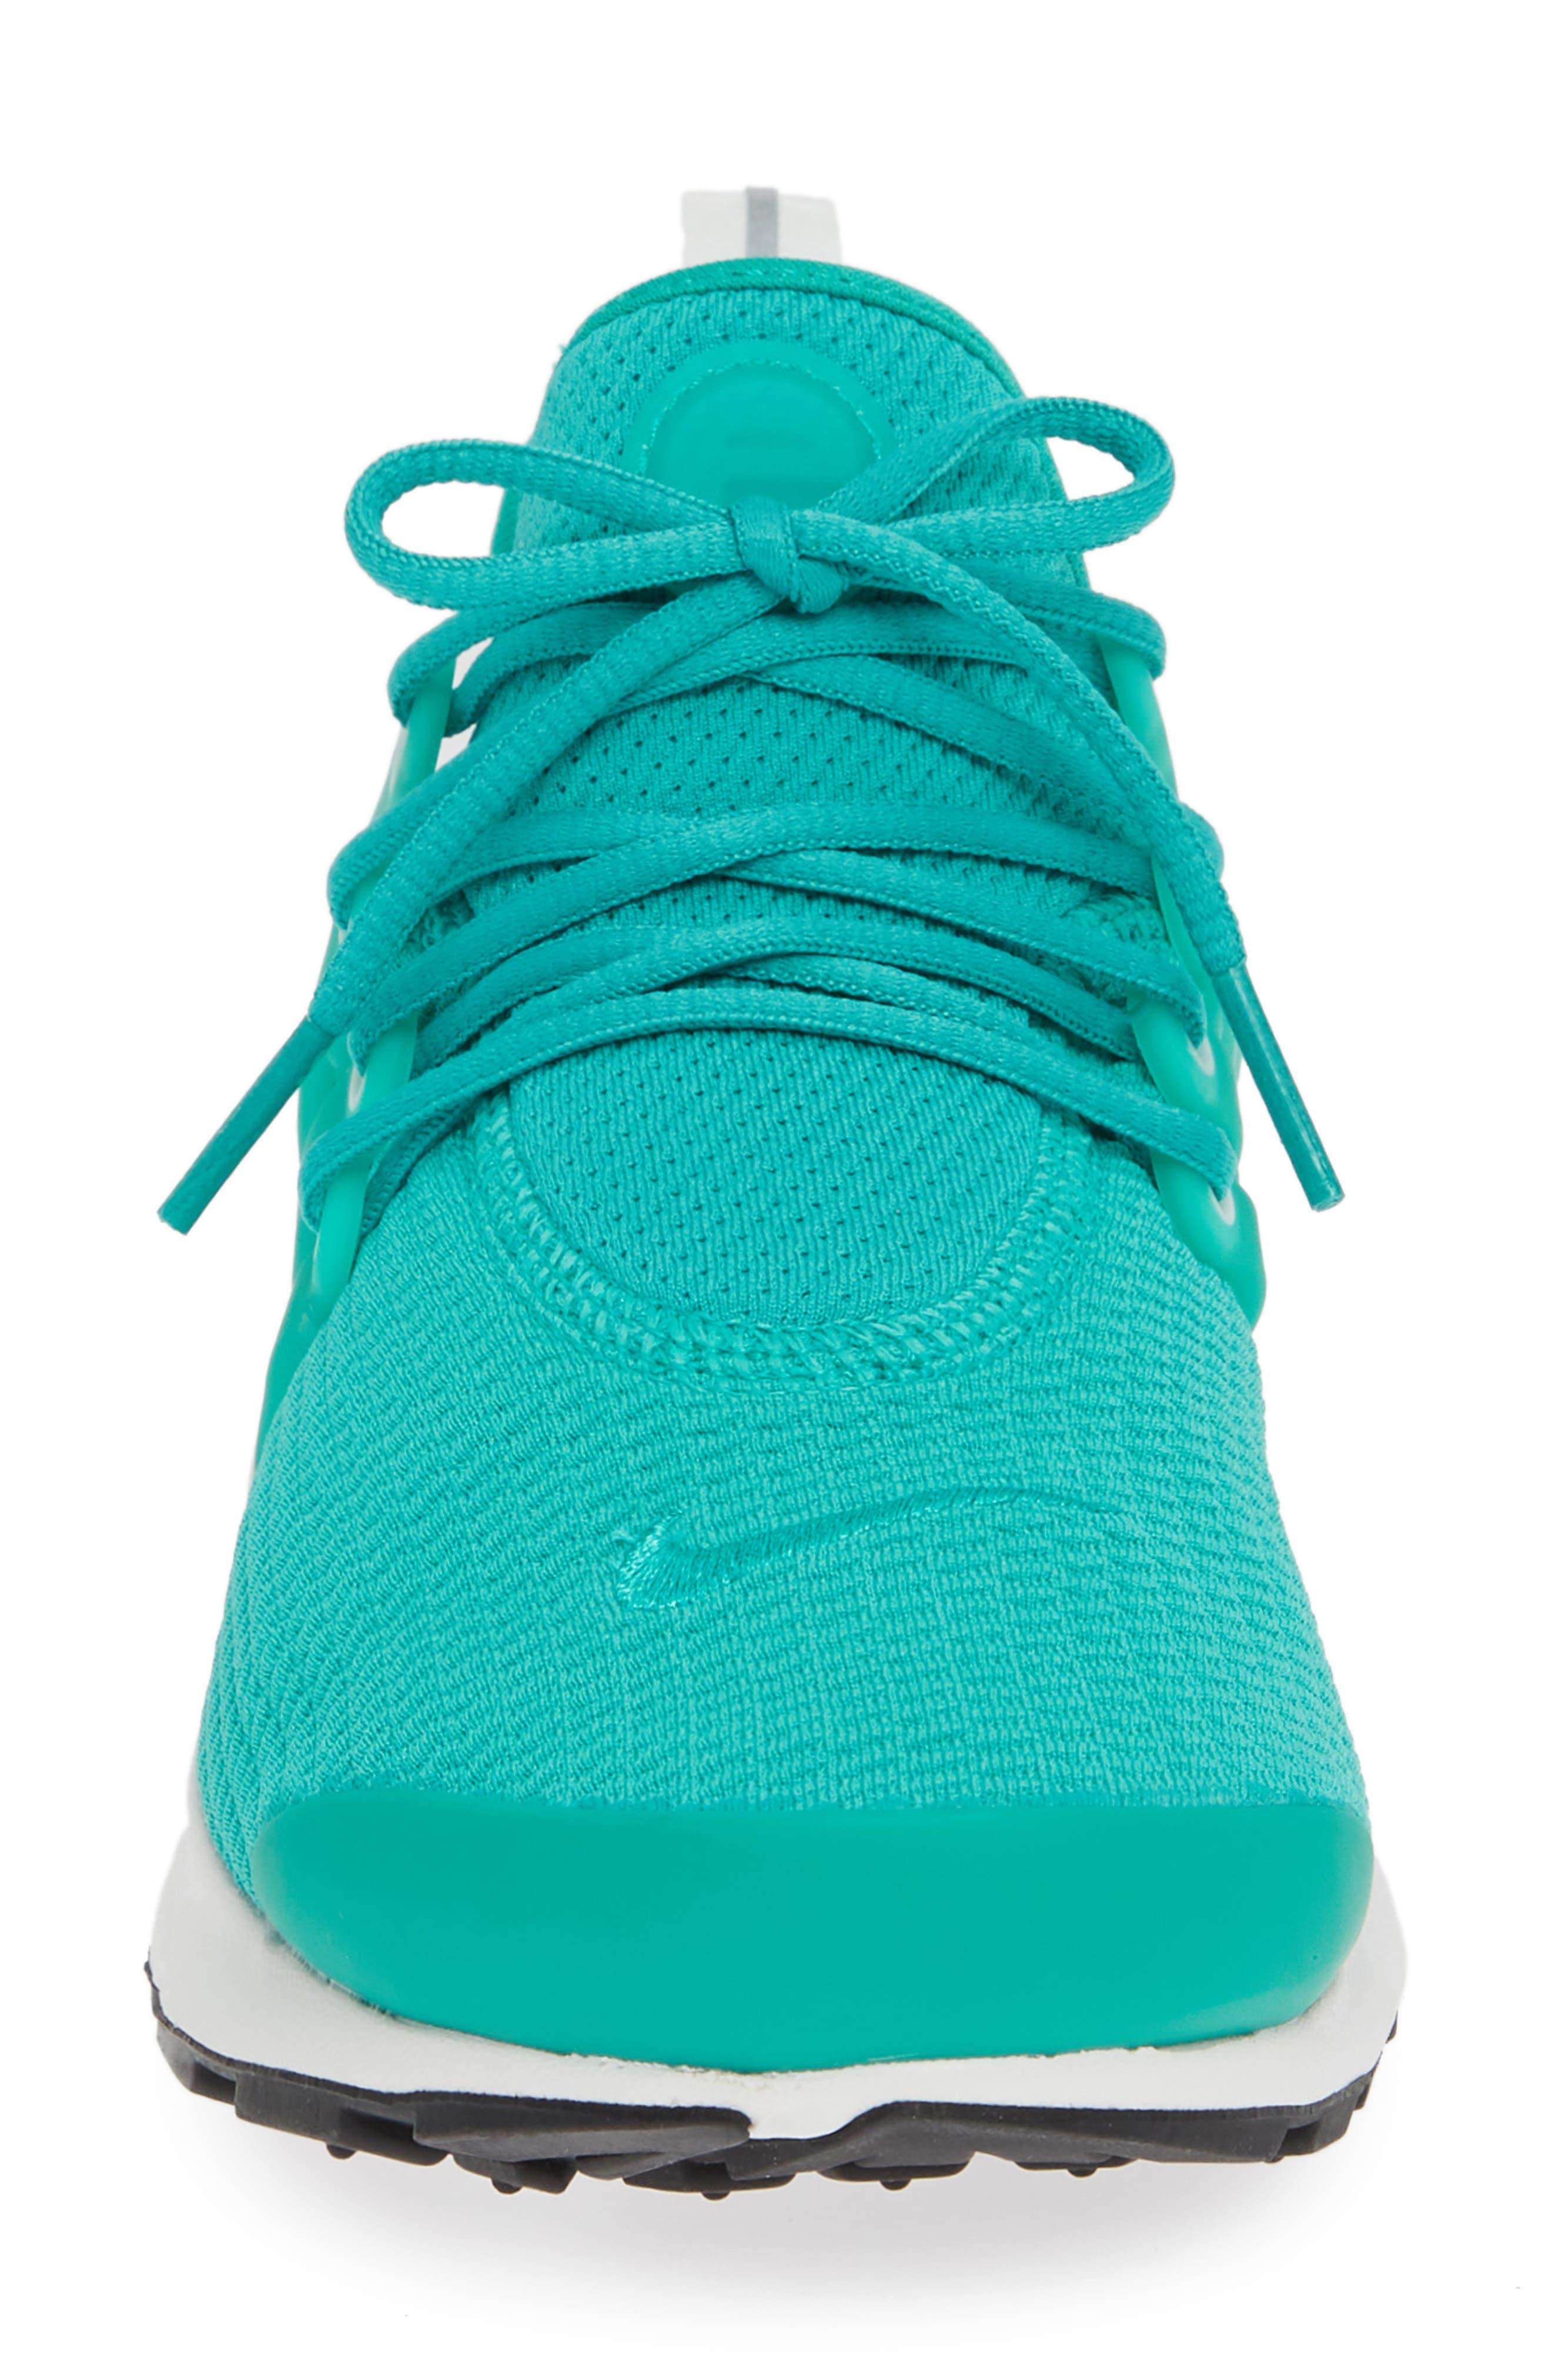 Air Presto Sneaker,                             Alternate thumbnail 4, color,                             Clear Emerald/ Summit White